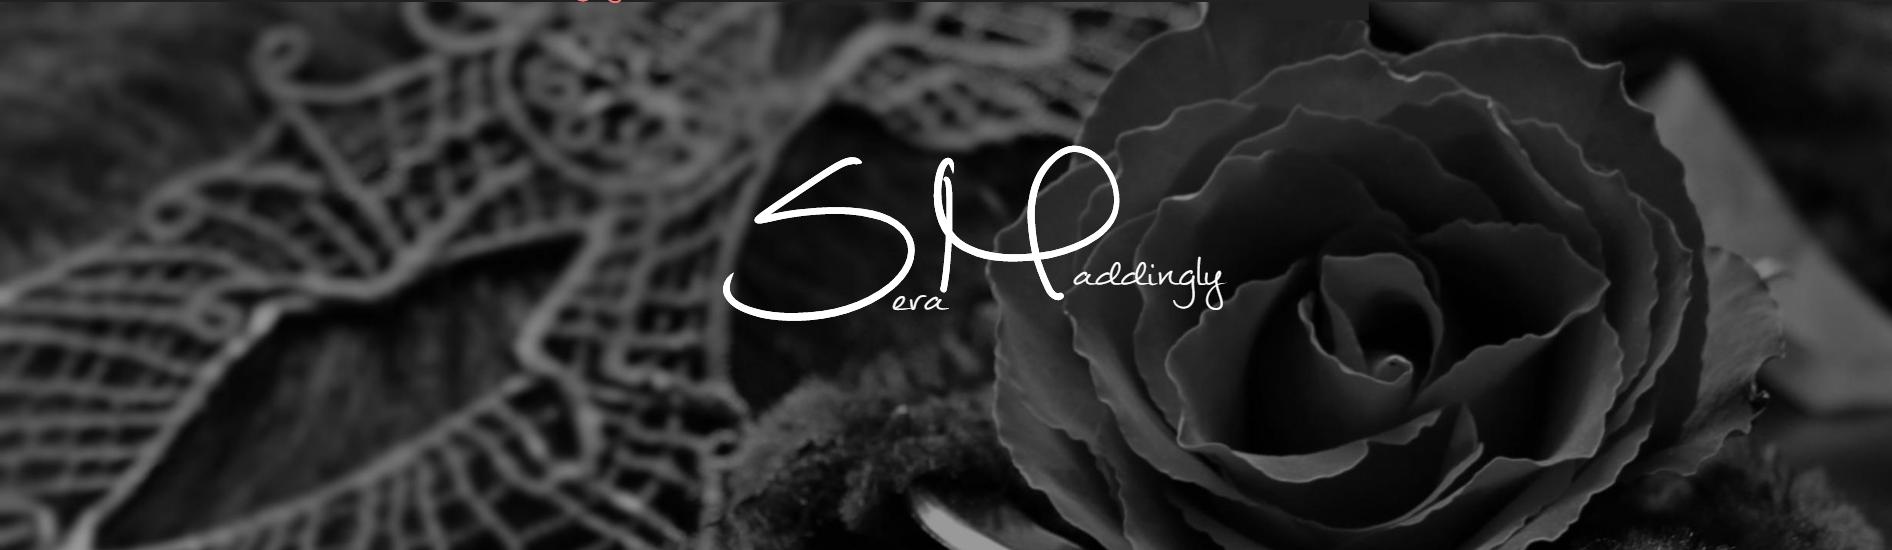 sera_maddingly_banner